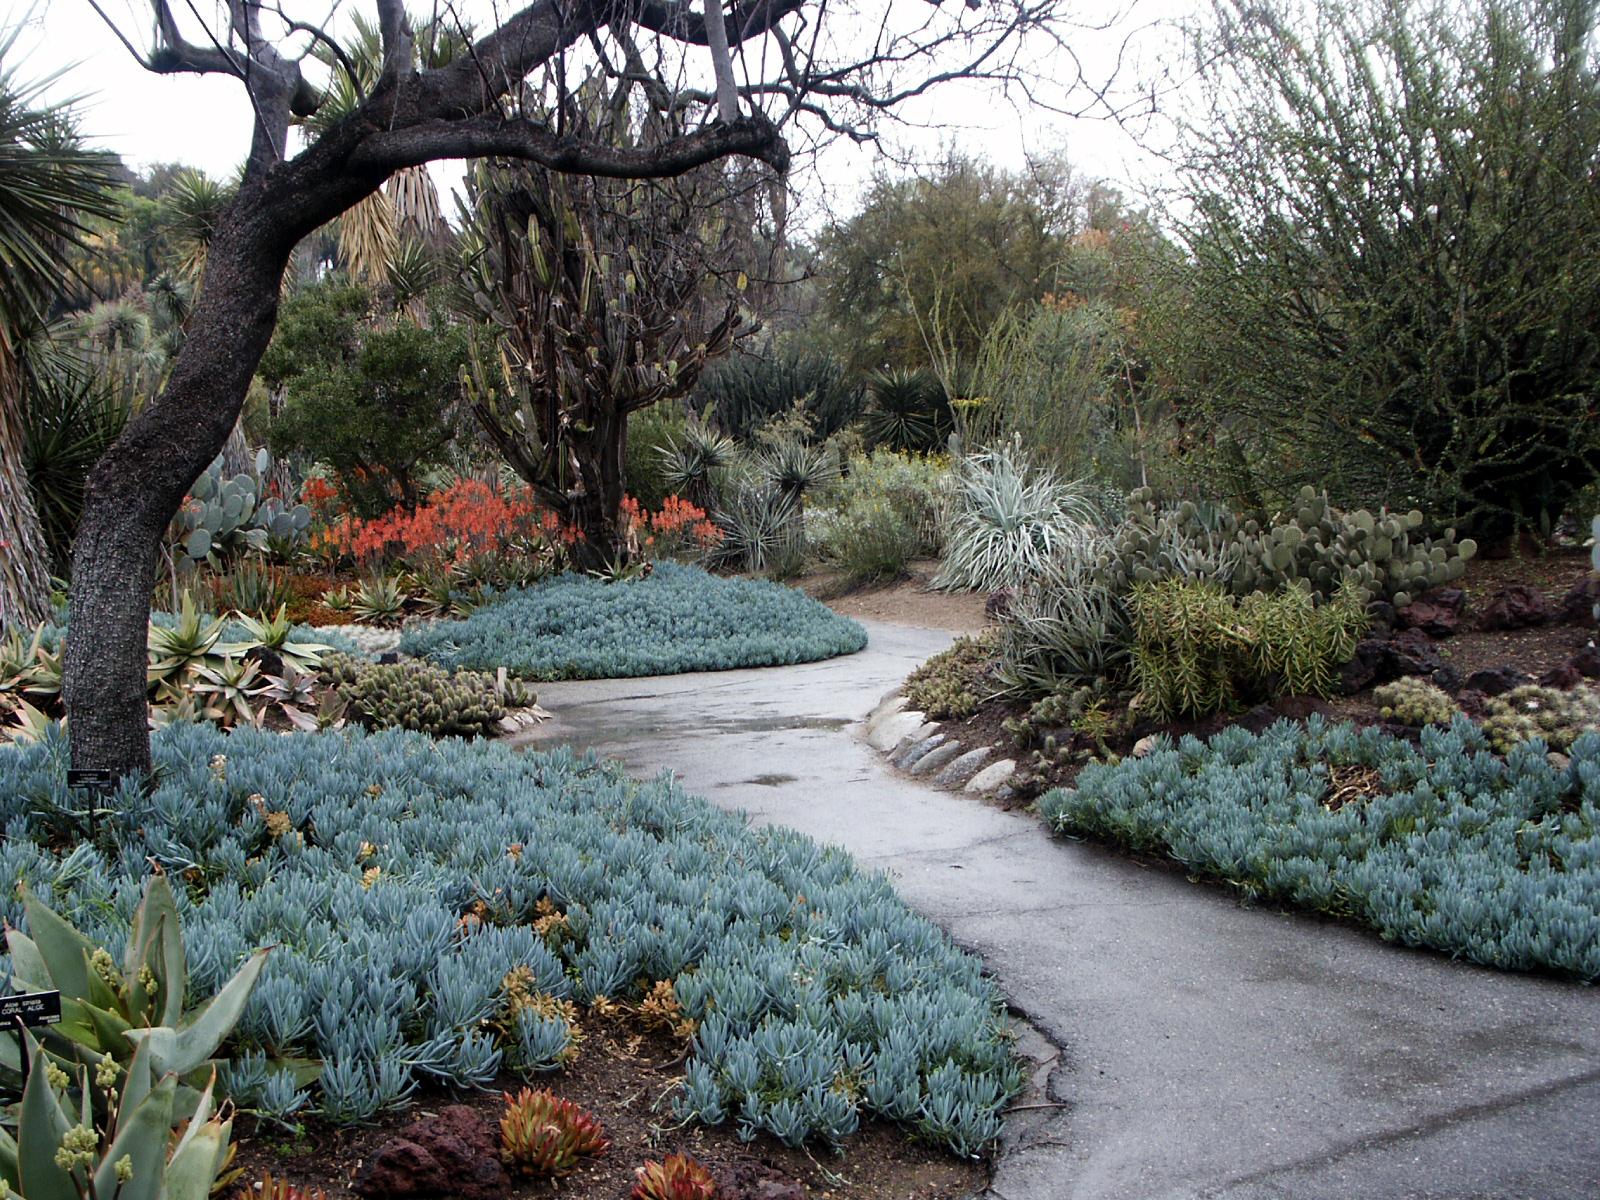 Senecio mandraliscae at Huntington Gardens